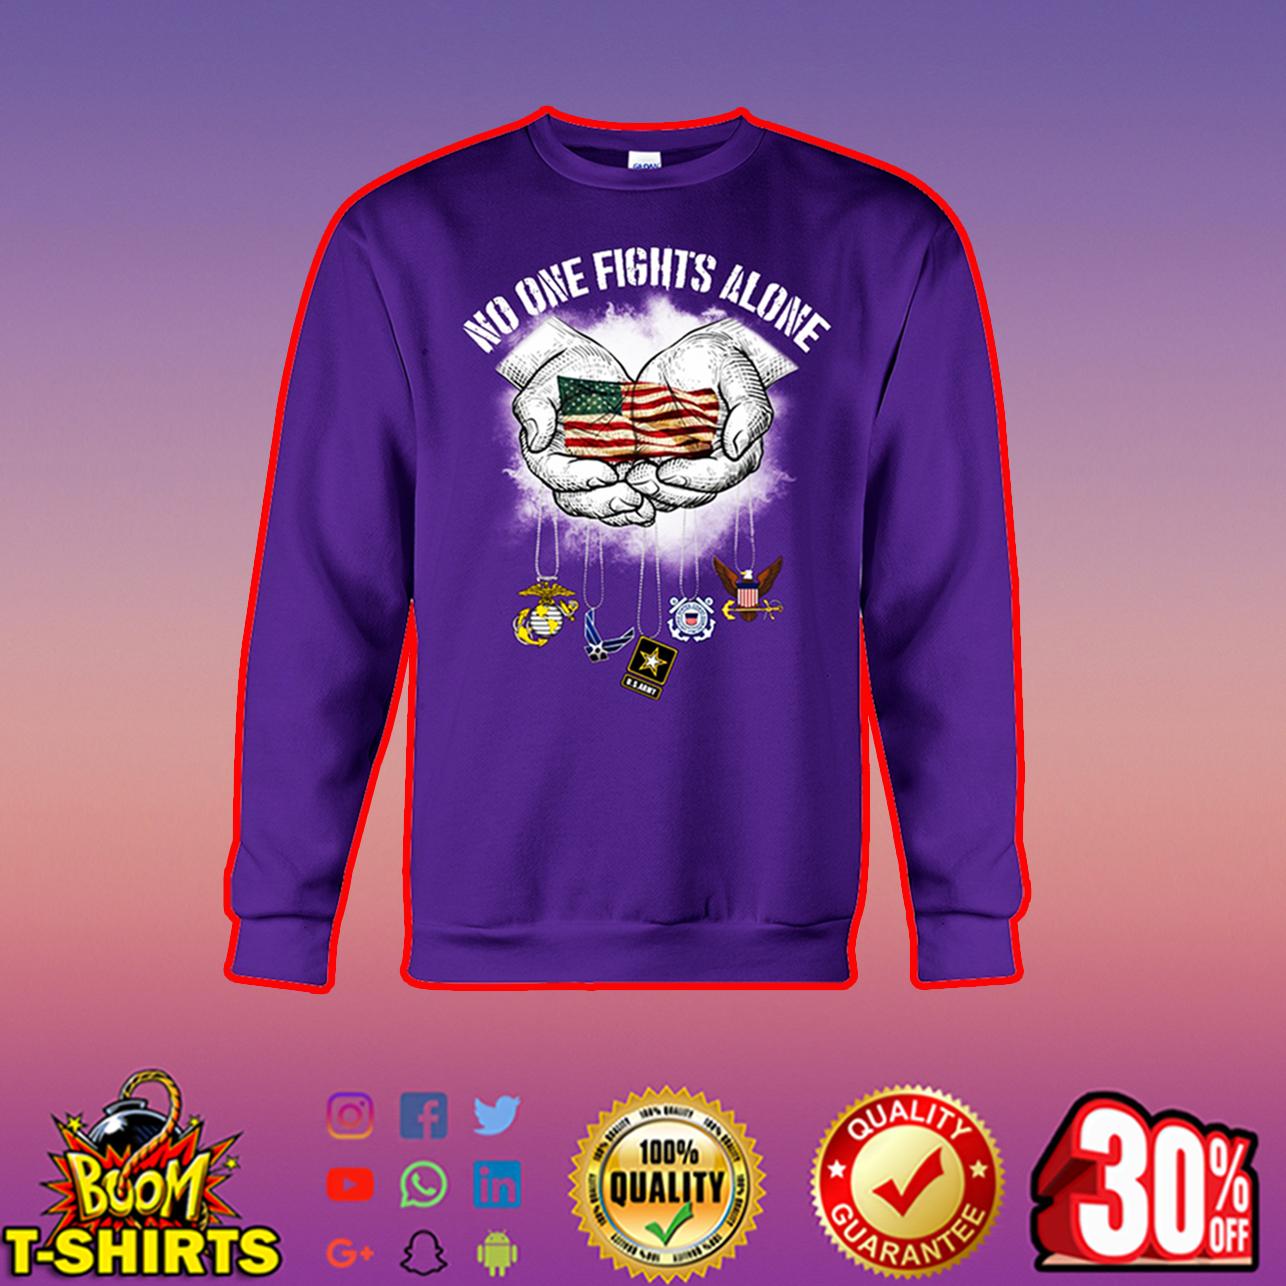 No one fights alone American flag sweatshirt